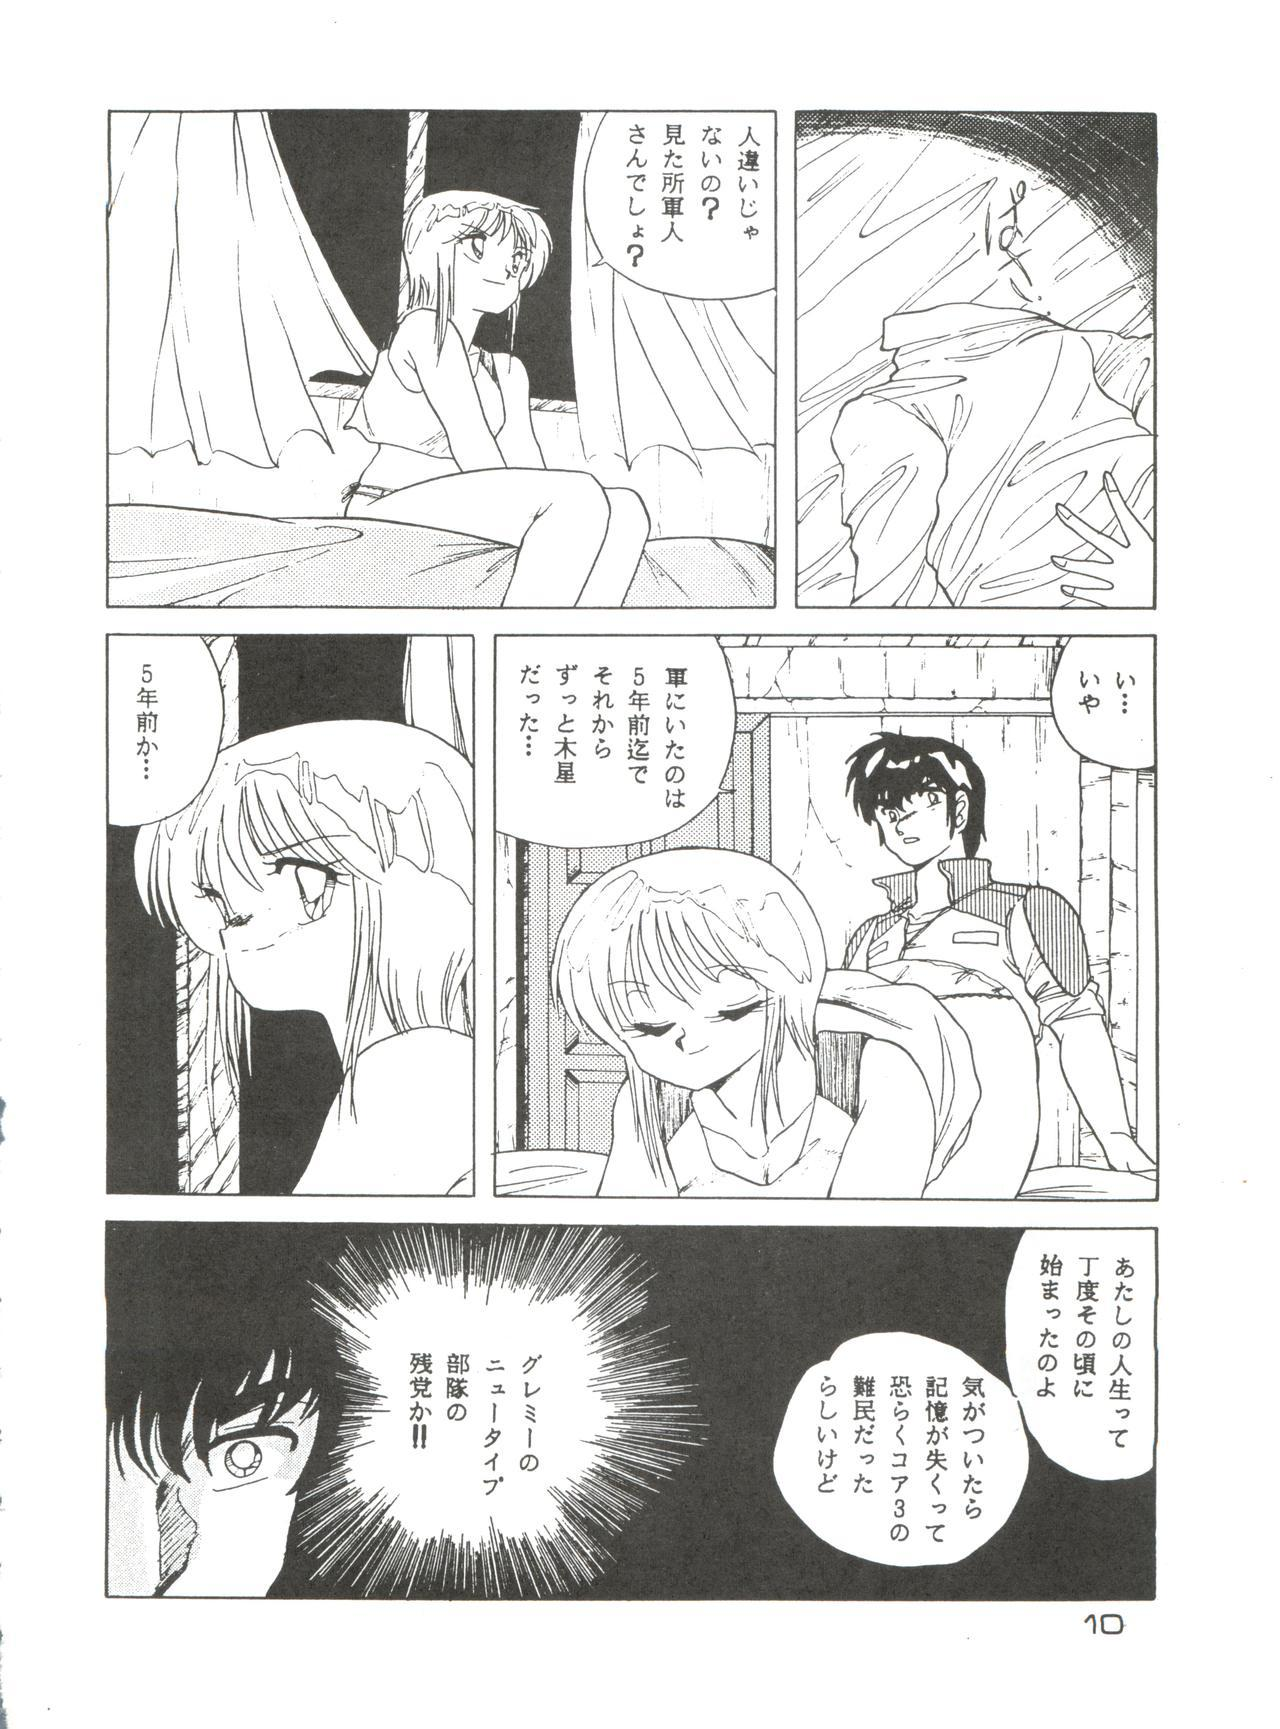 [Studio Fuck (Various) Onapet 7 (Sonic Soldier Borgman, Gundam ZZ, Osomatsu-kun) 9